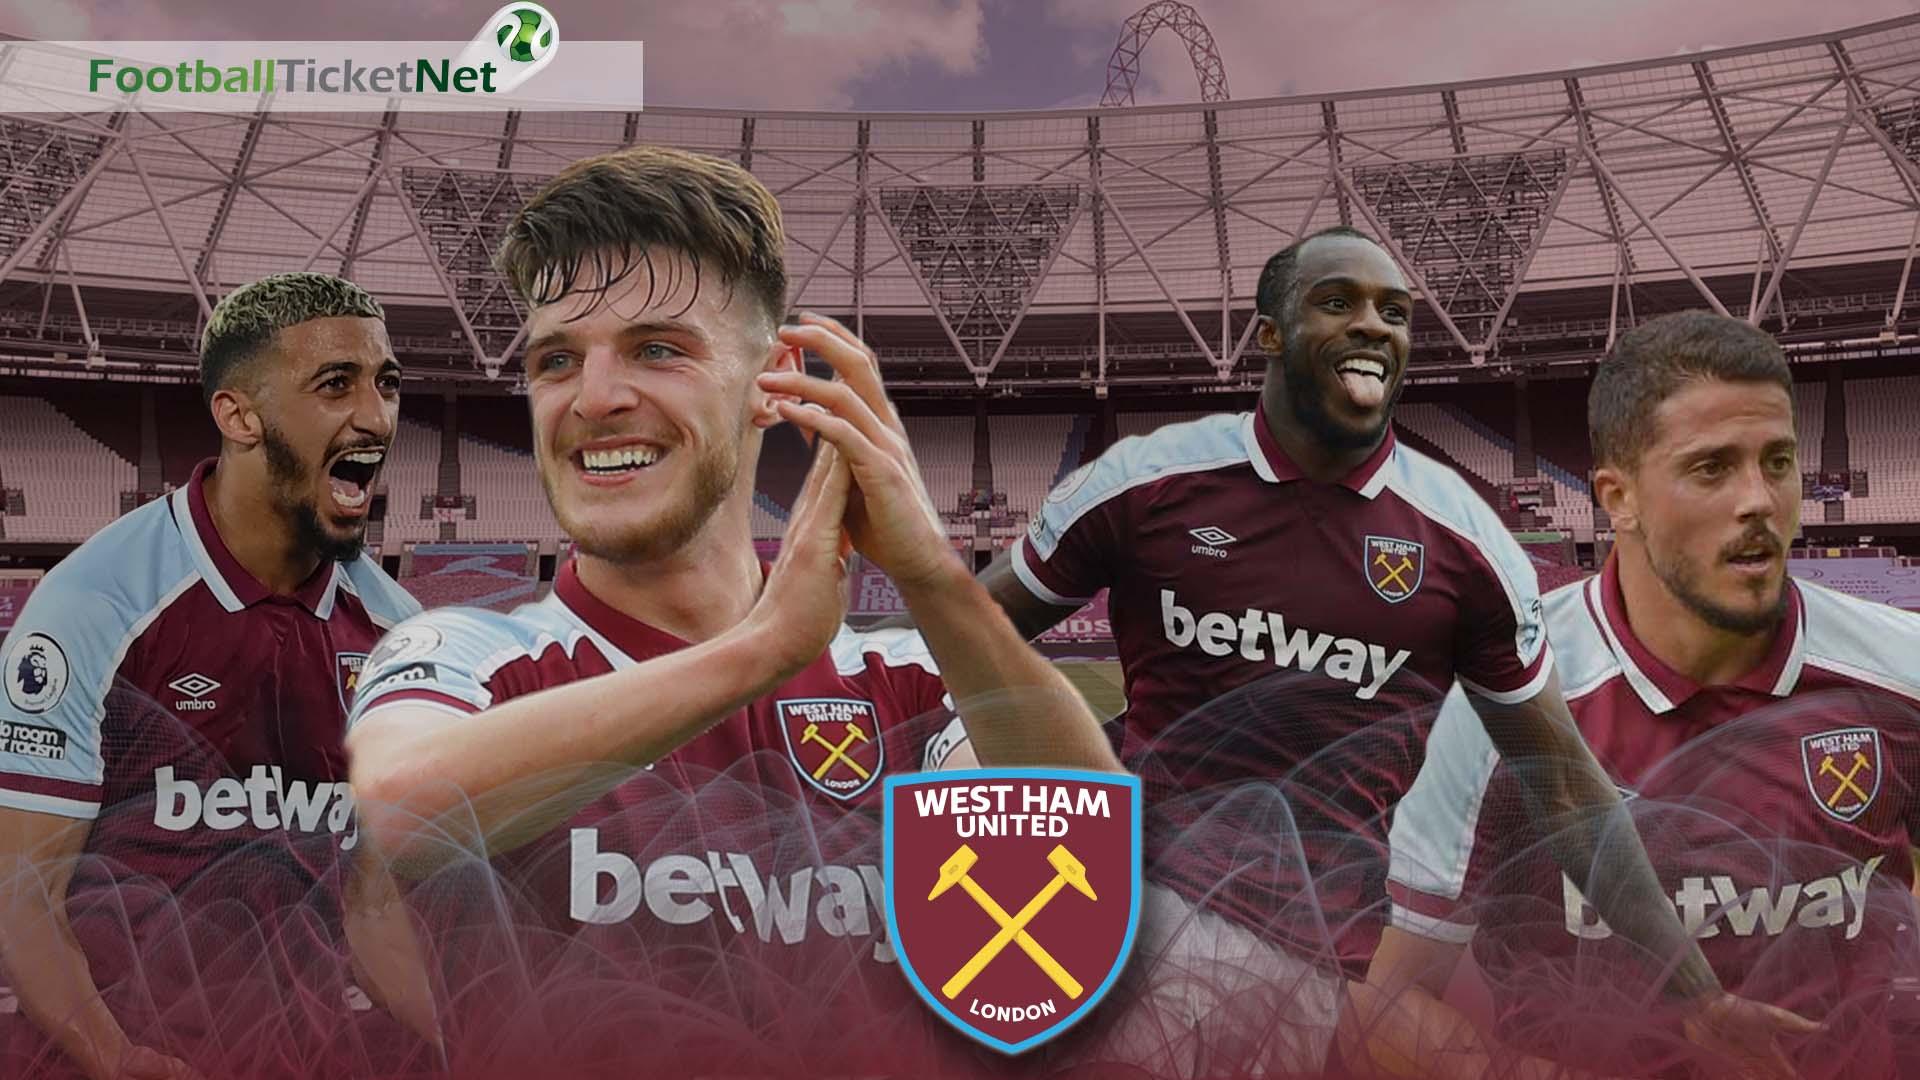 Buy West Ham United Tickets 2020 21 Football Ticket Net